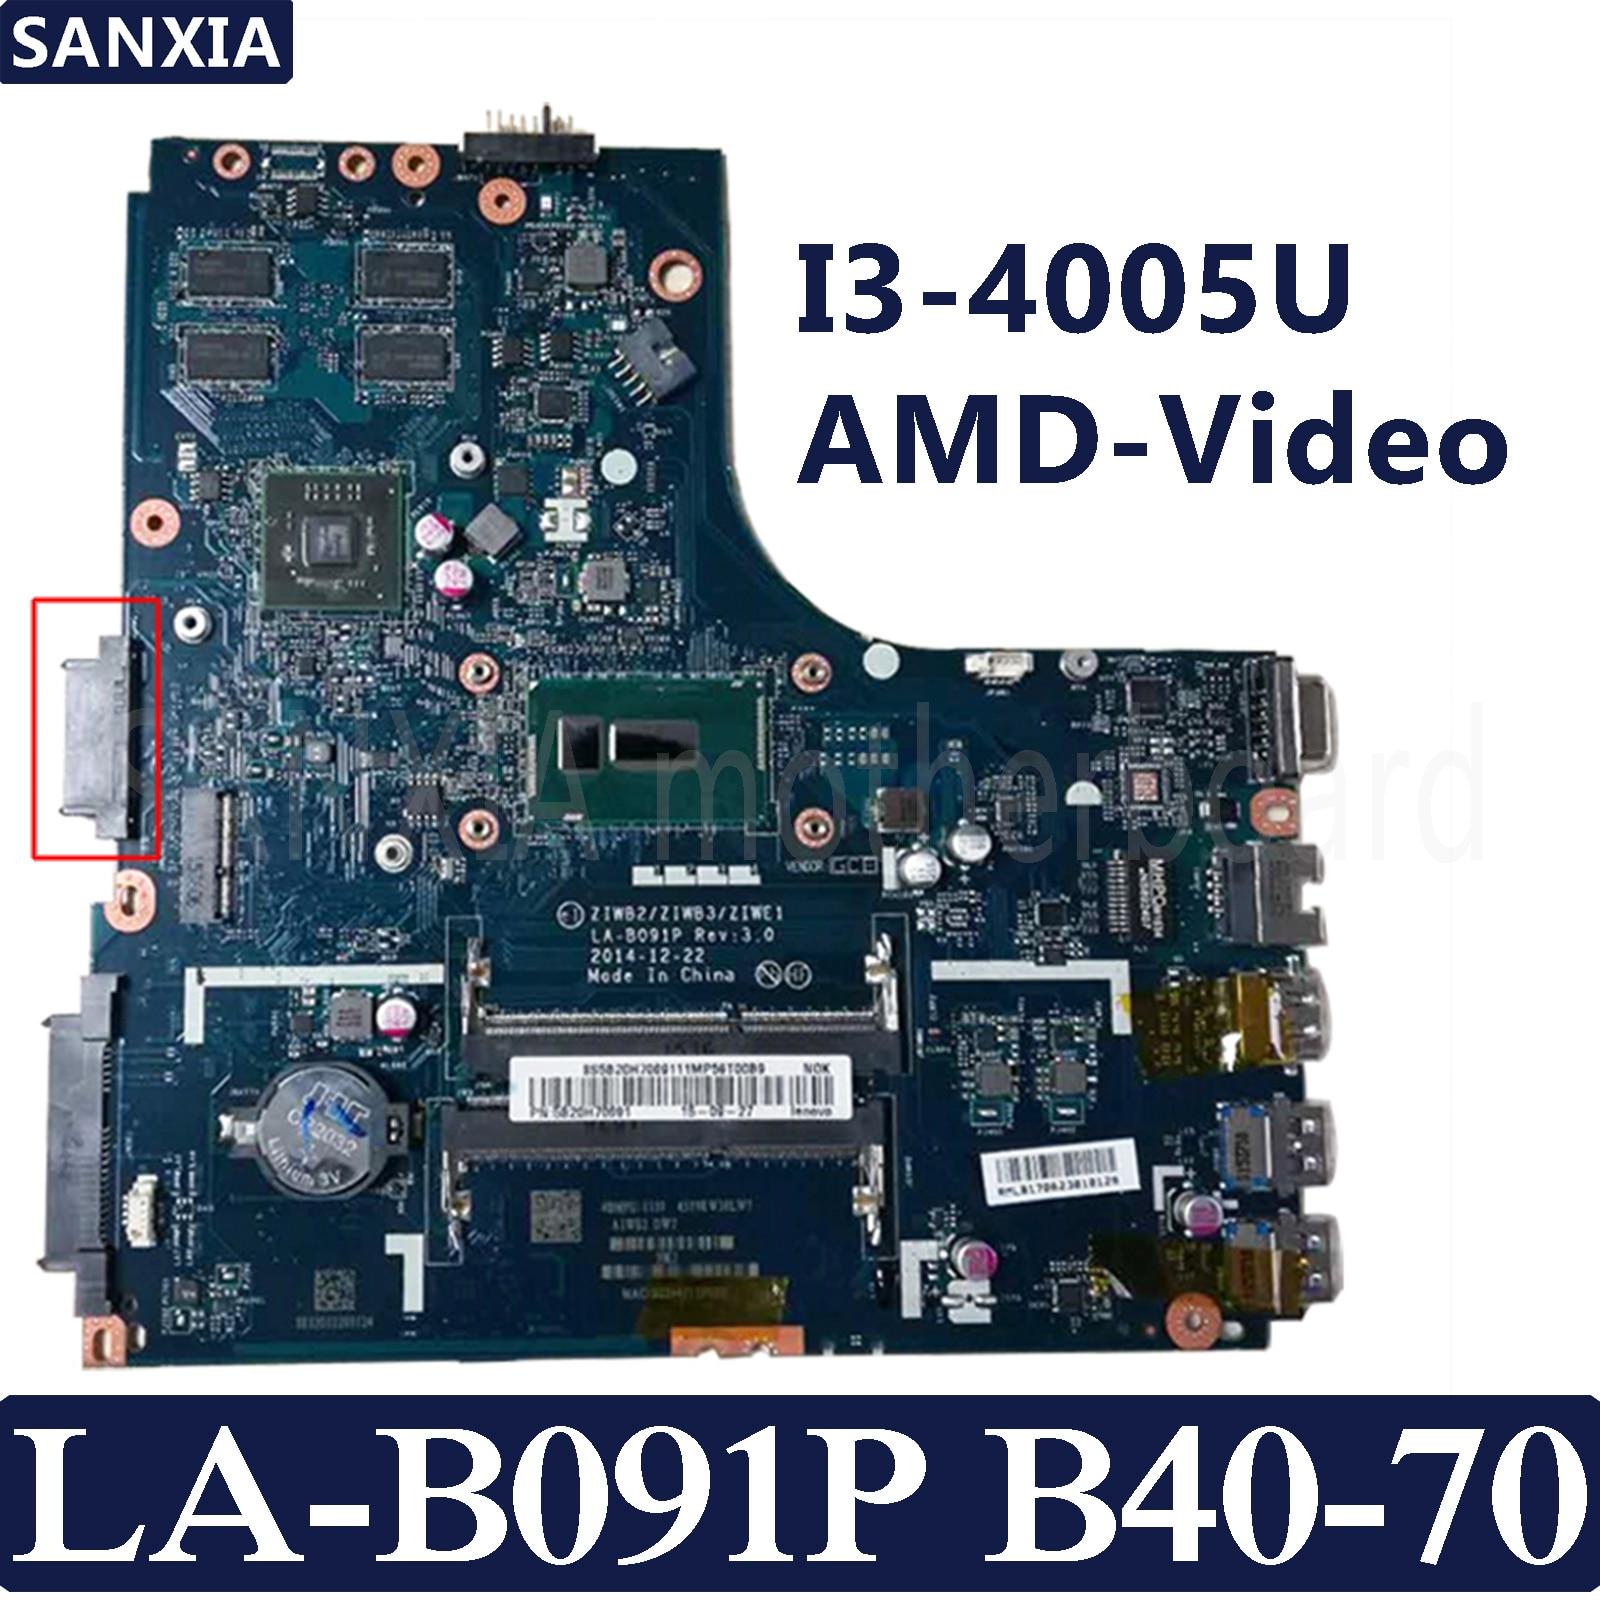 KEFU ZIWB2/ZIWB3/ZIWE1 LA-B091P اللوحة المحمول لينوفو B40-70 اختبار اللوحة الأصلية I3-4005U AMD-فيديو